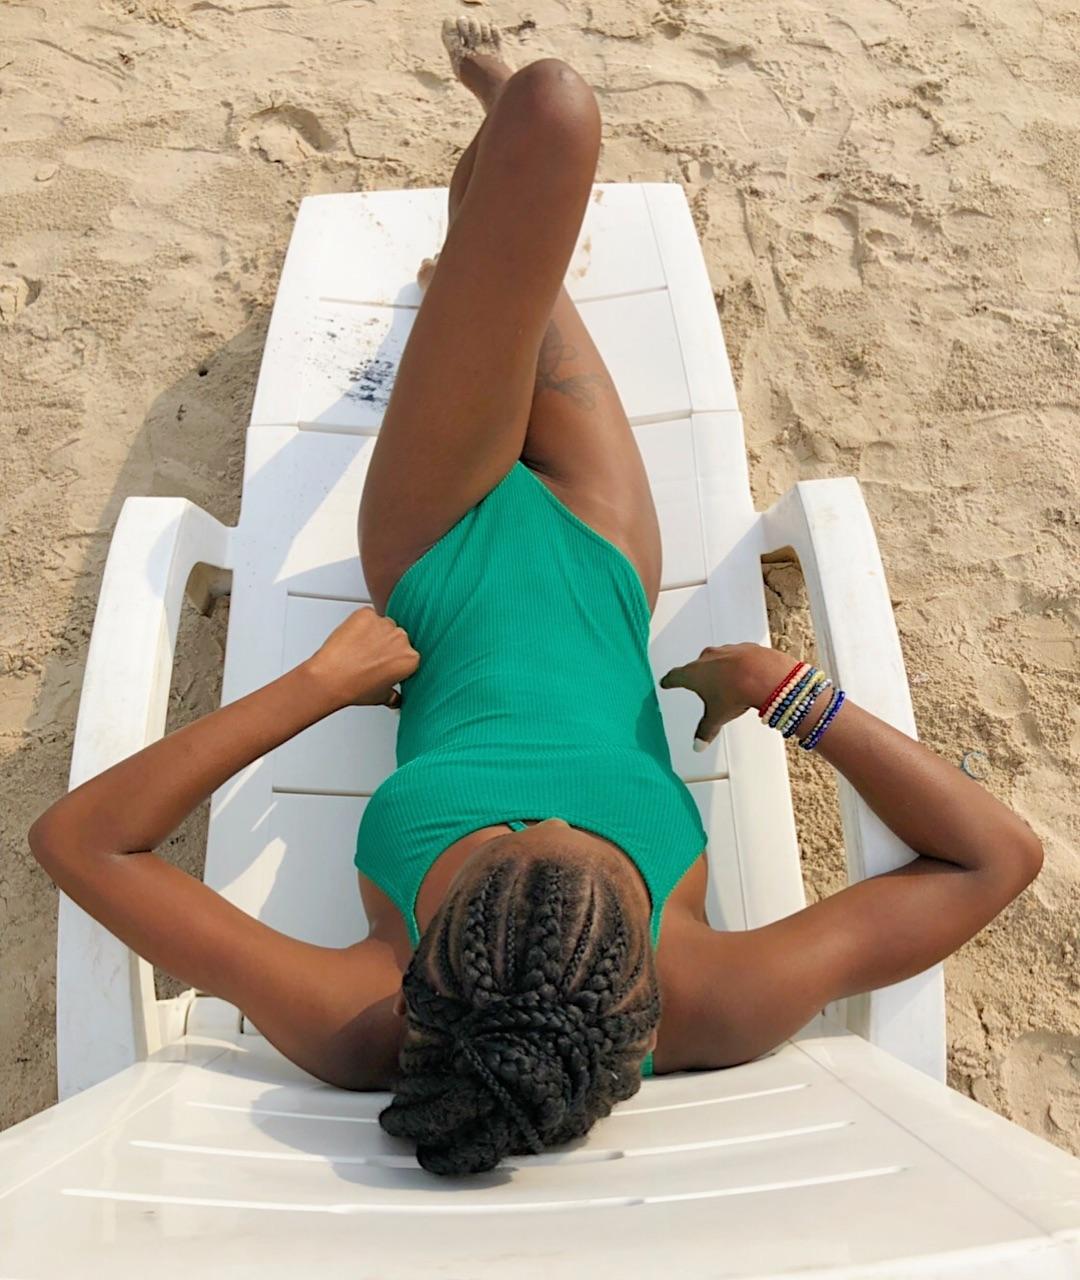 Khloe flaunts bikini body